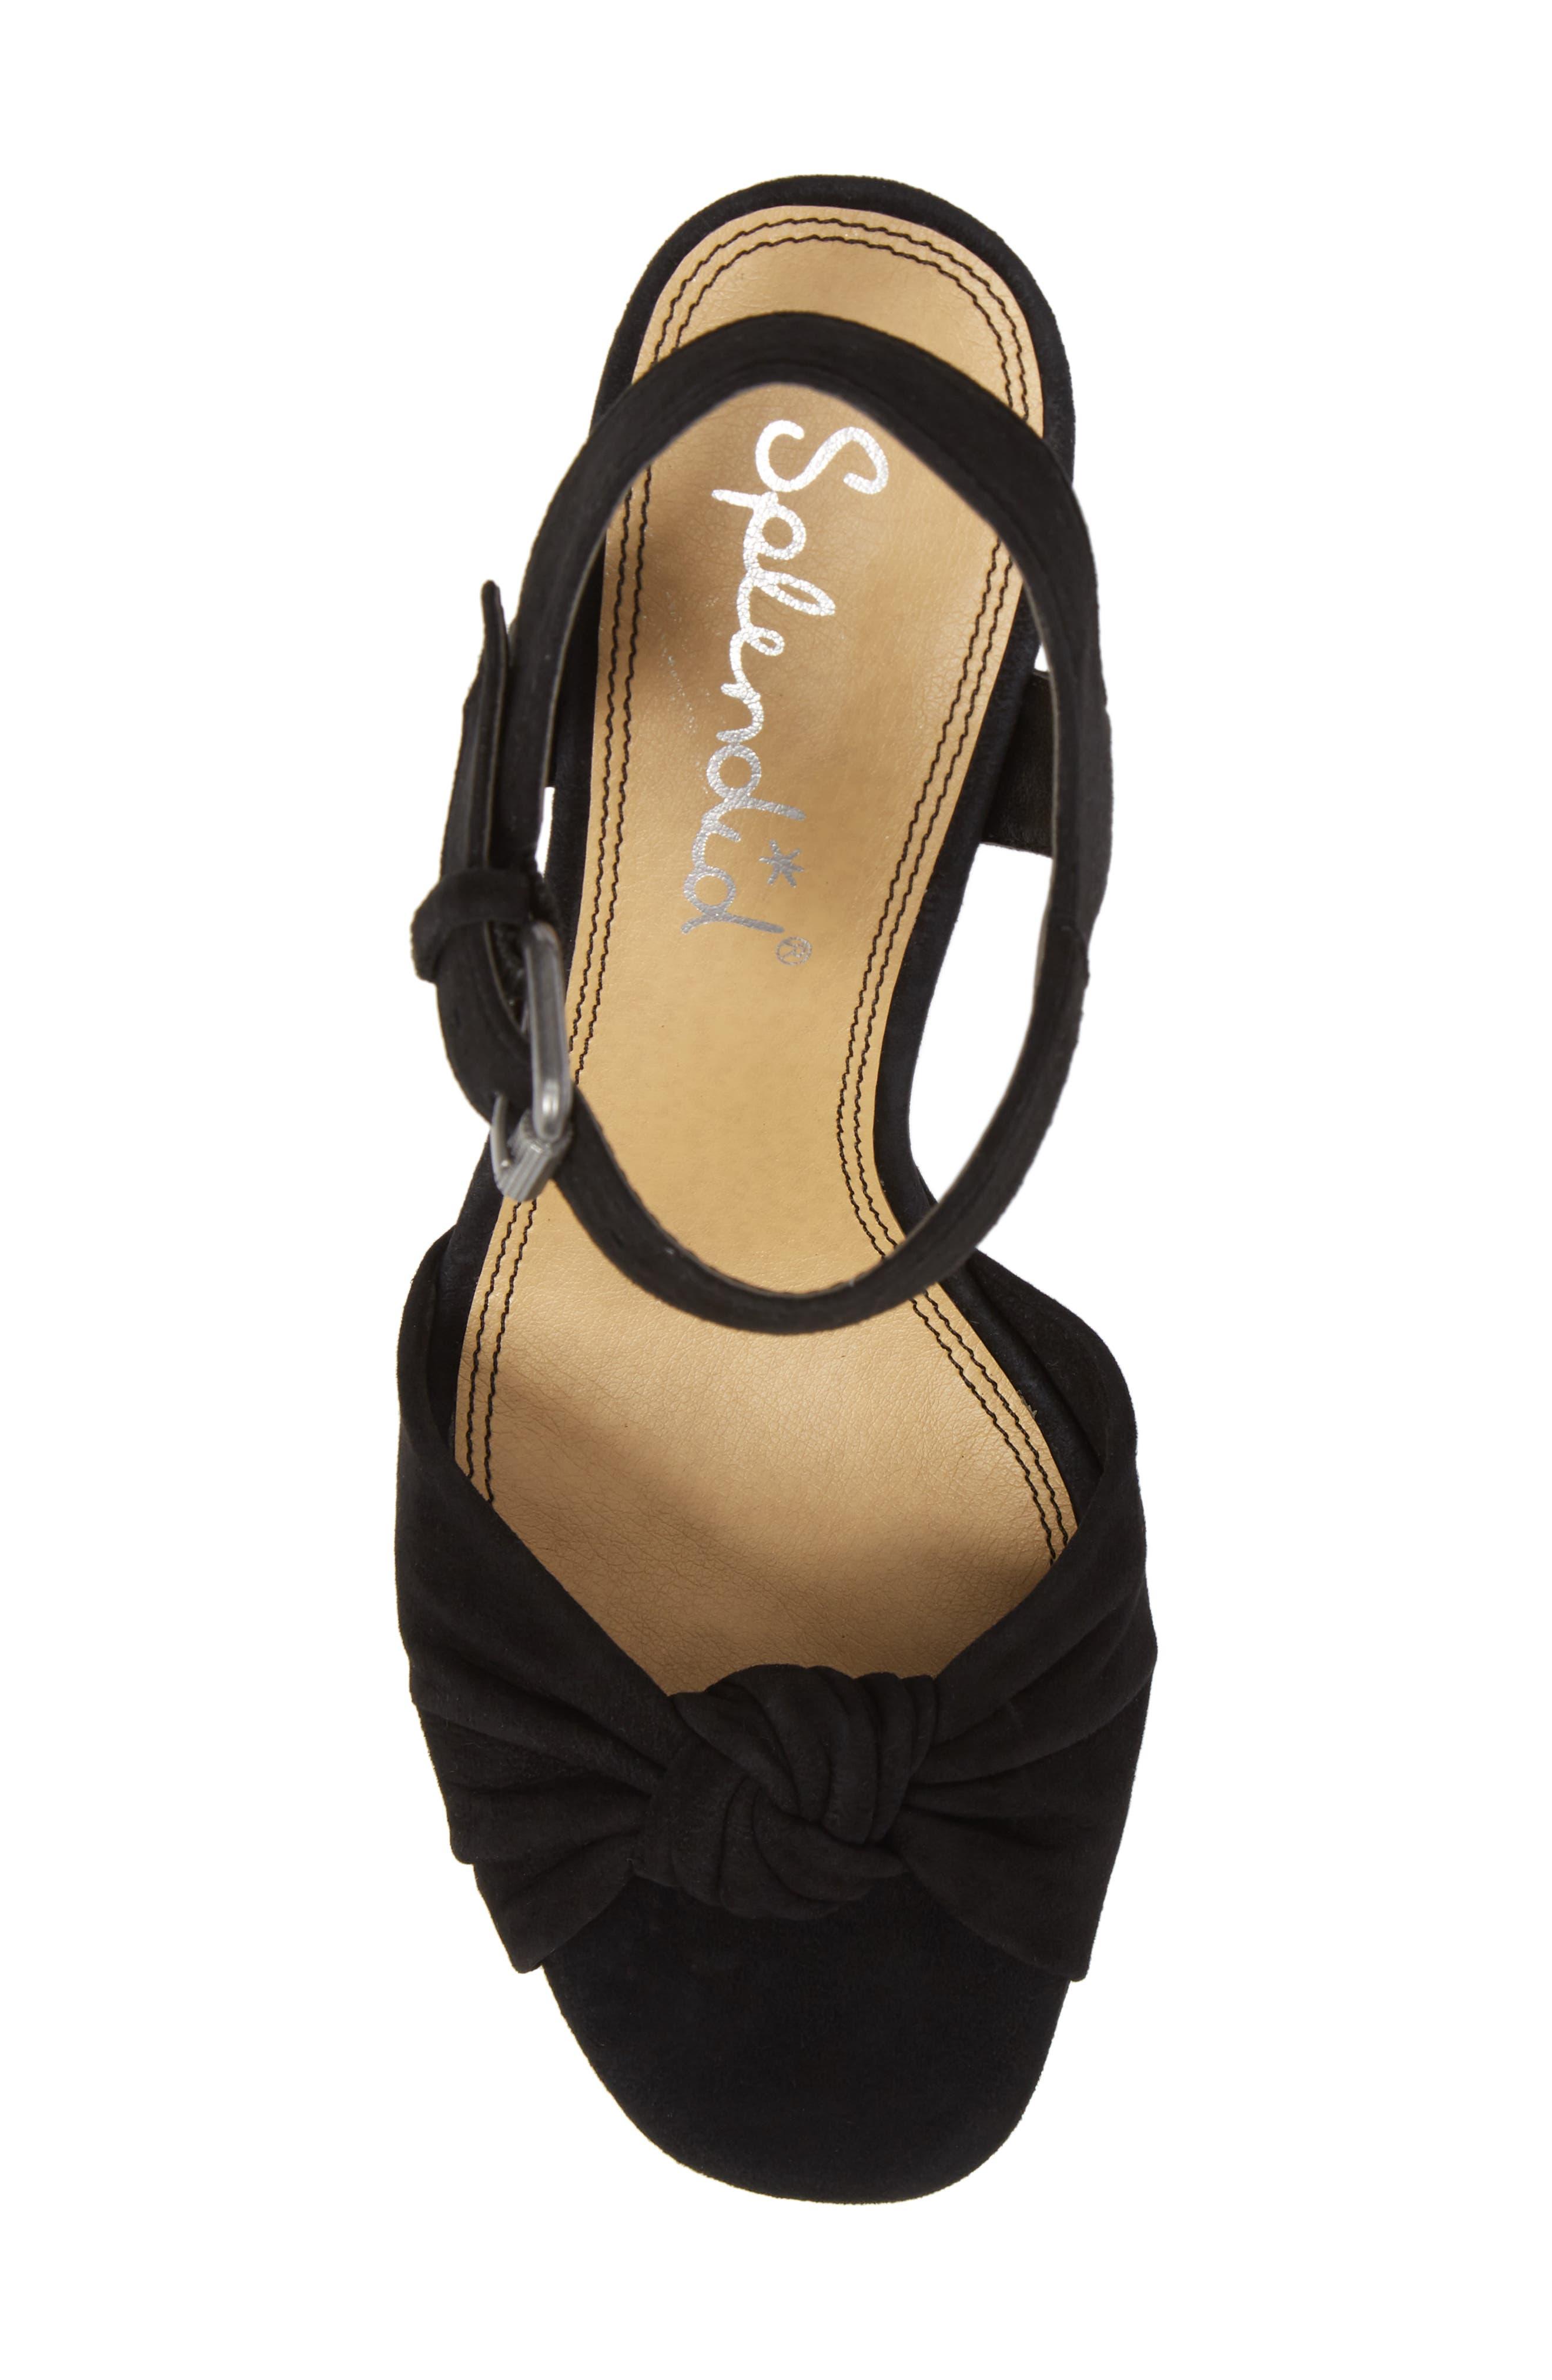 Bates Platform Sandal,                             Alternate thumbnail 5, color,                             BLACK SUEDE